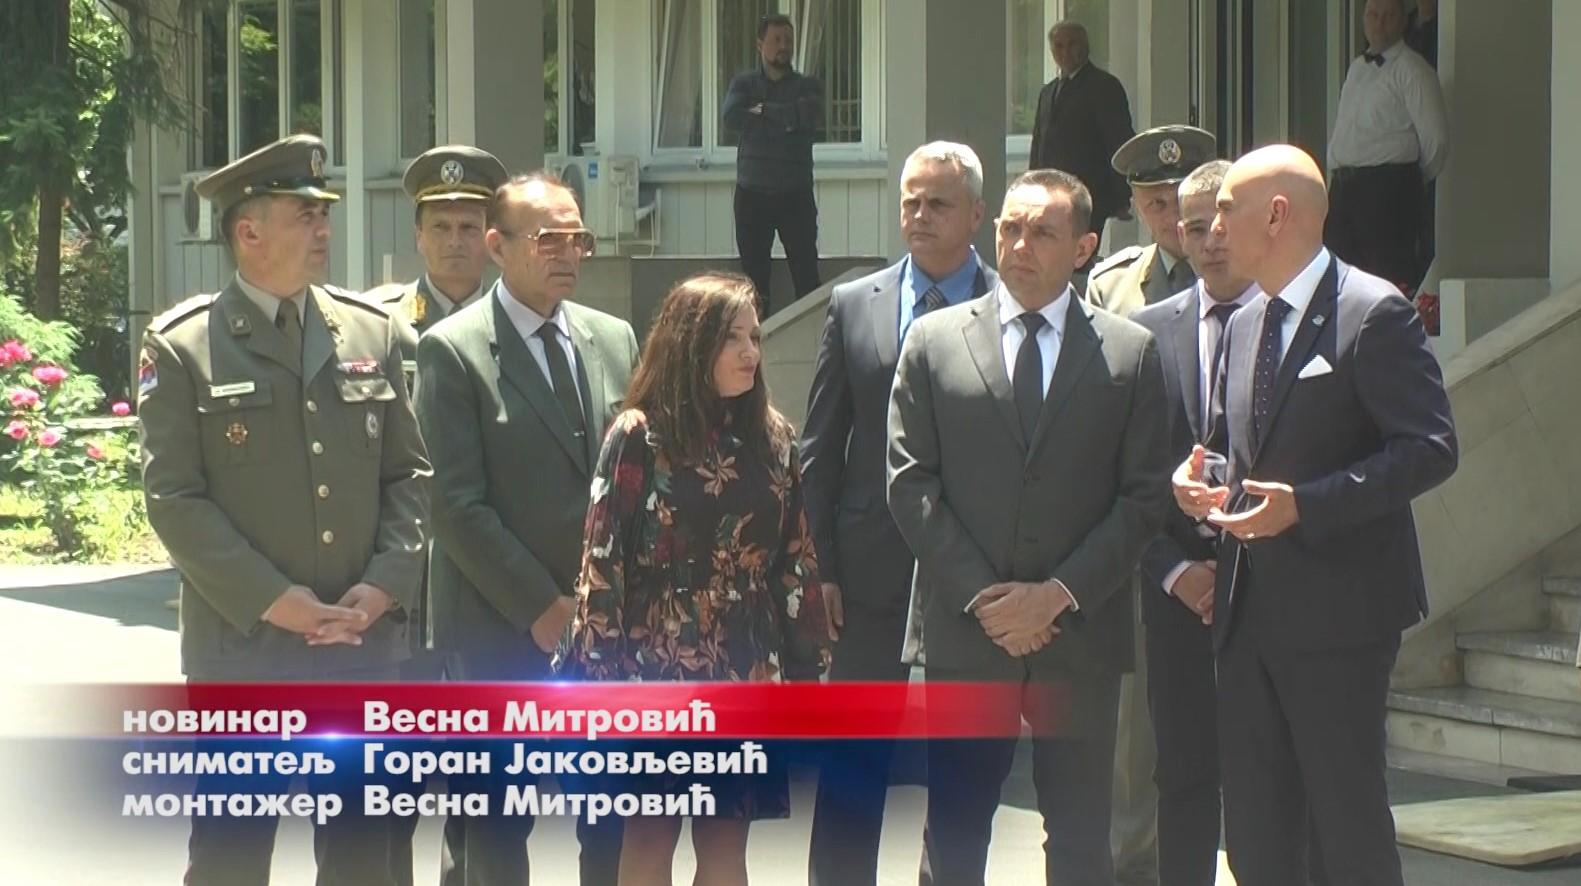 Ministar odbrane Aleksandar Vulin otvorio u Trajal korporaciji dva nova pogona